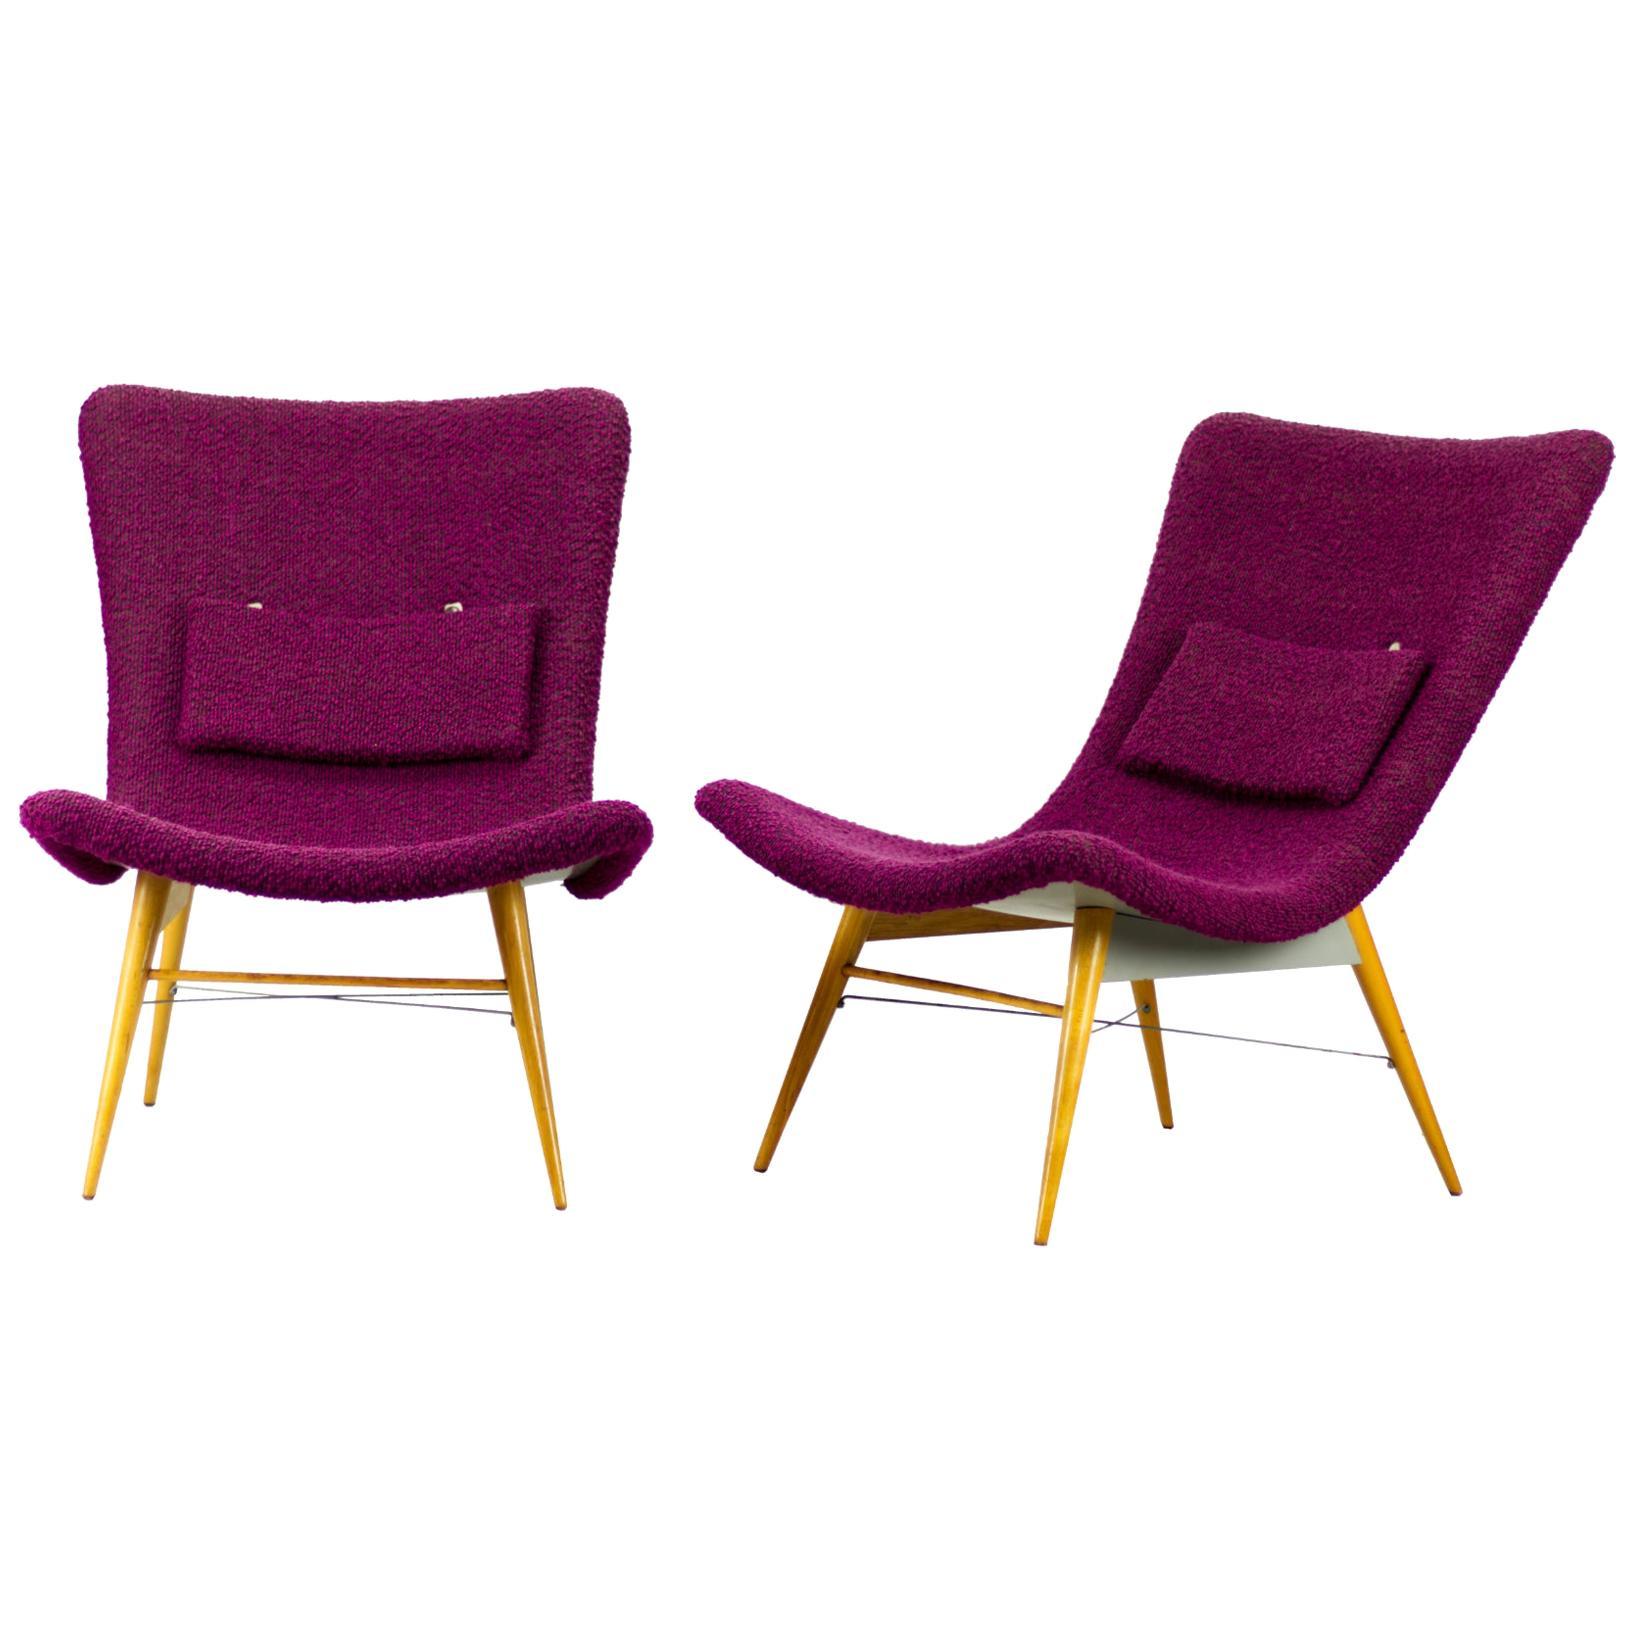 Mid Century Lounge Chairs / Armchairs by M. Navrátil Czechoslovakia 1965